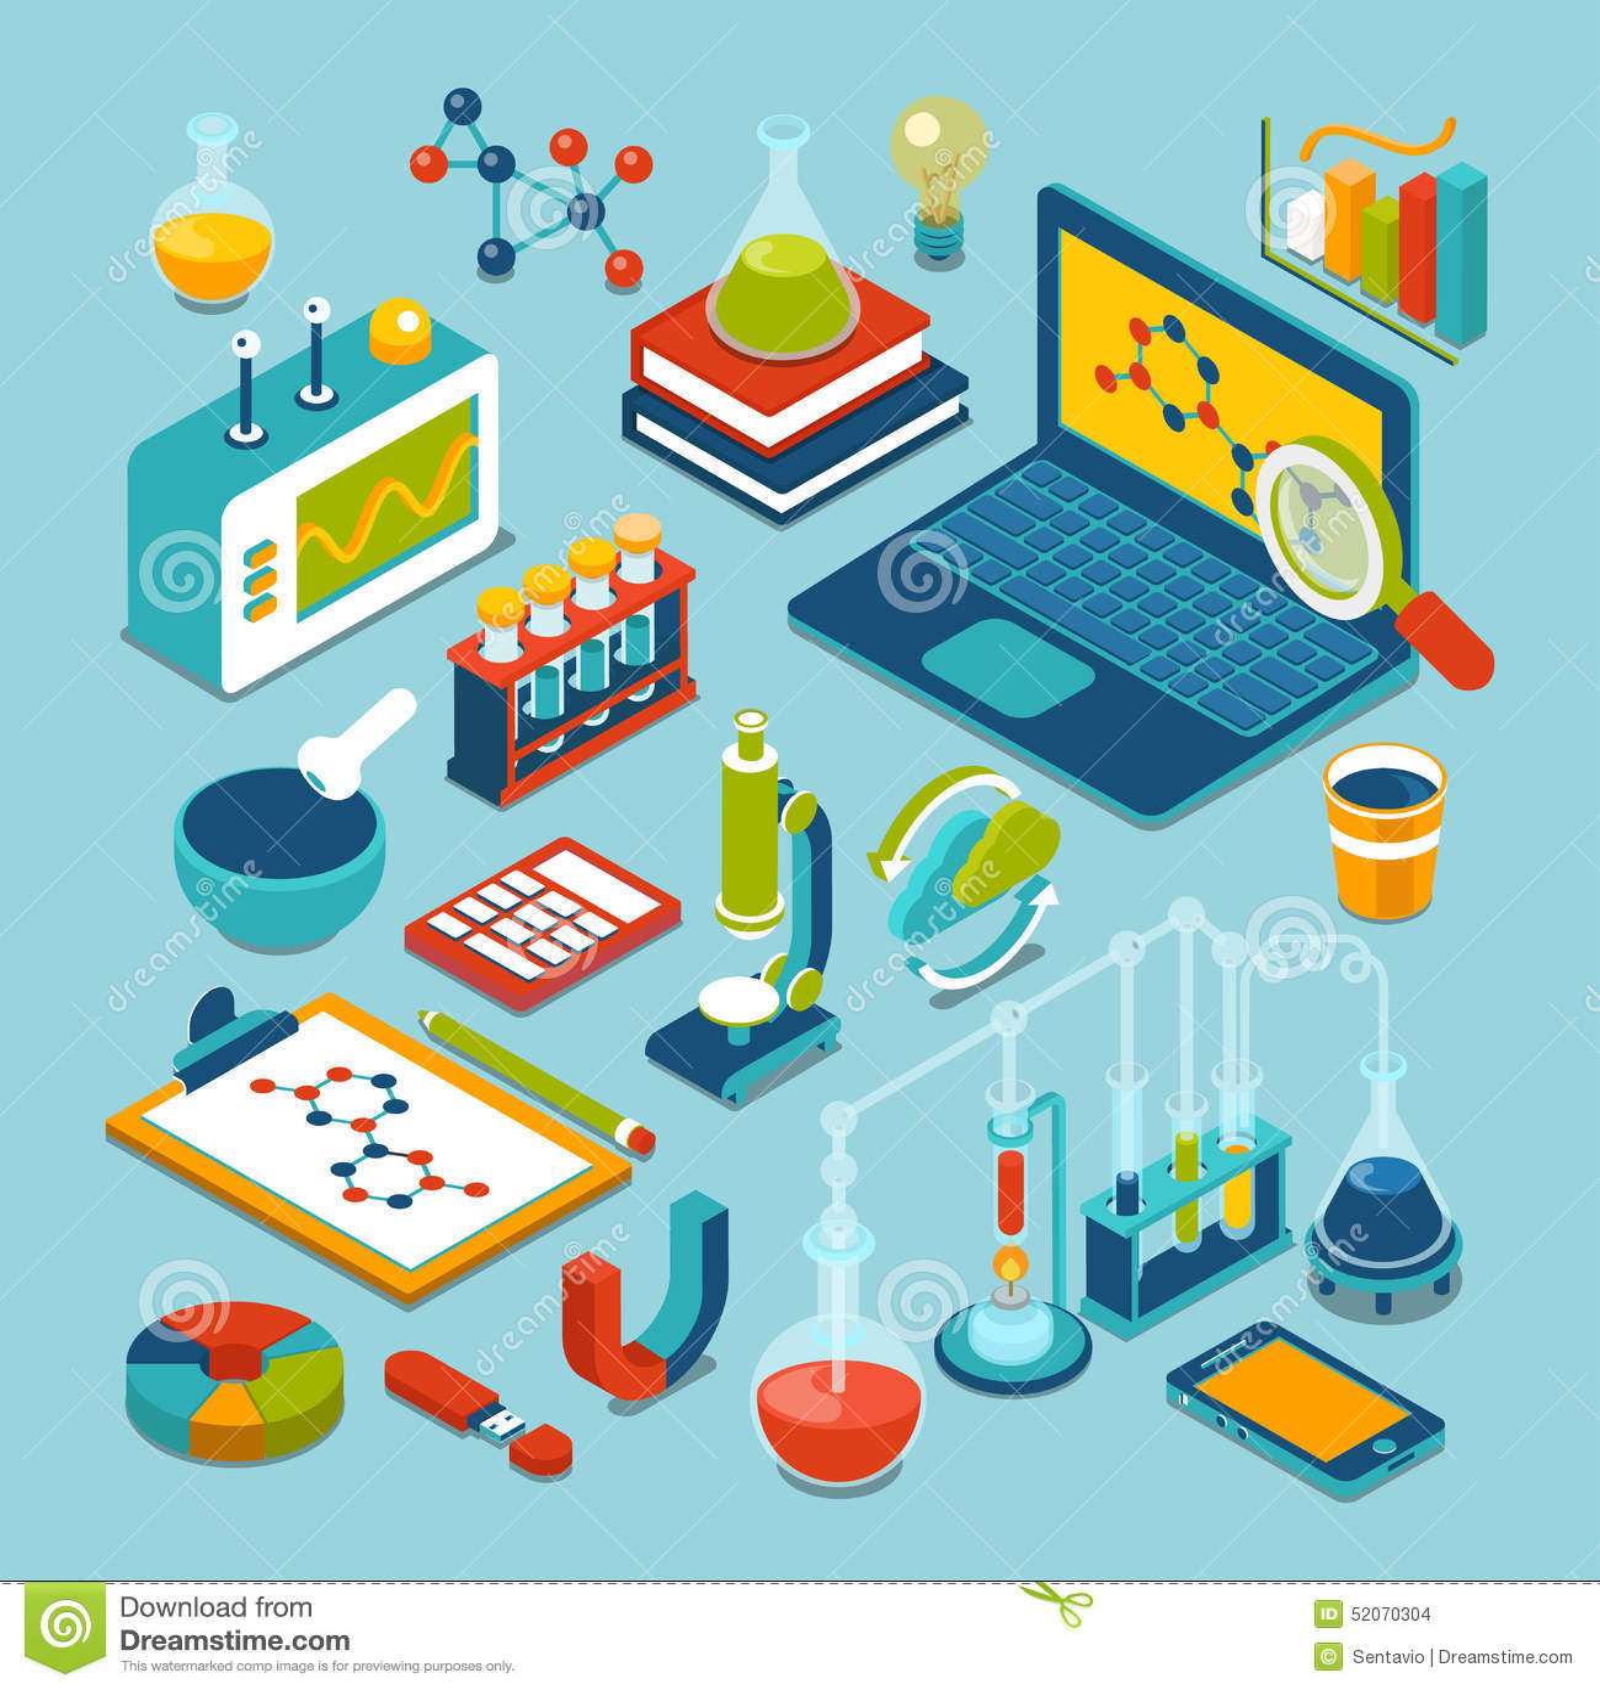 research technology International journal of modern engineering and research technology.